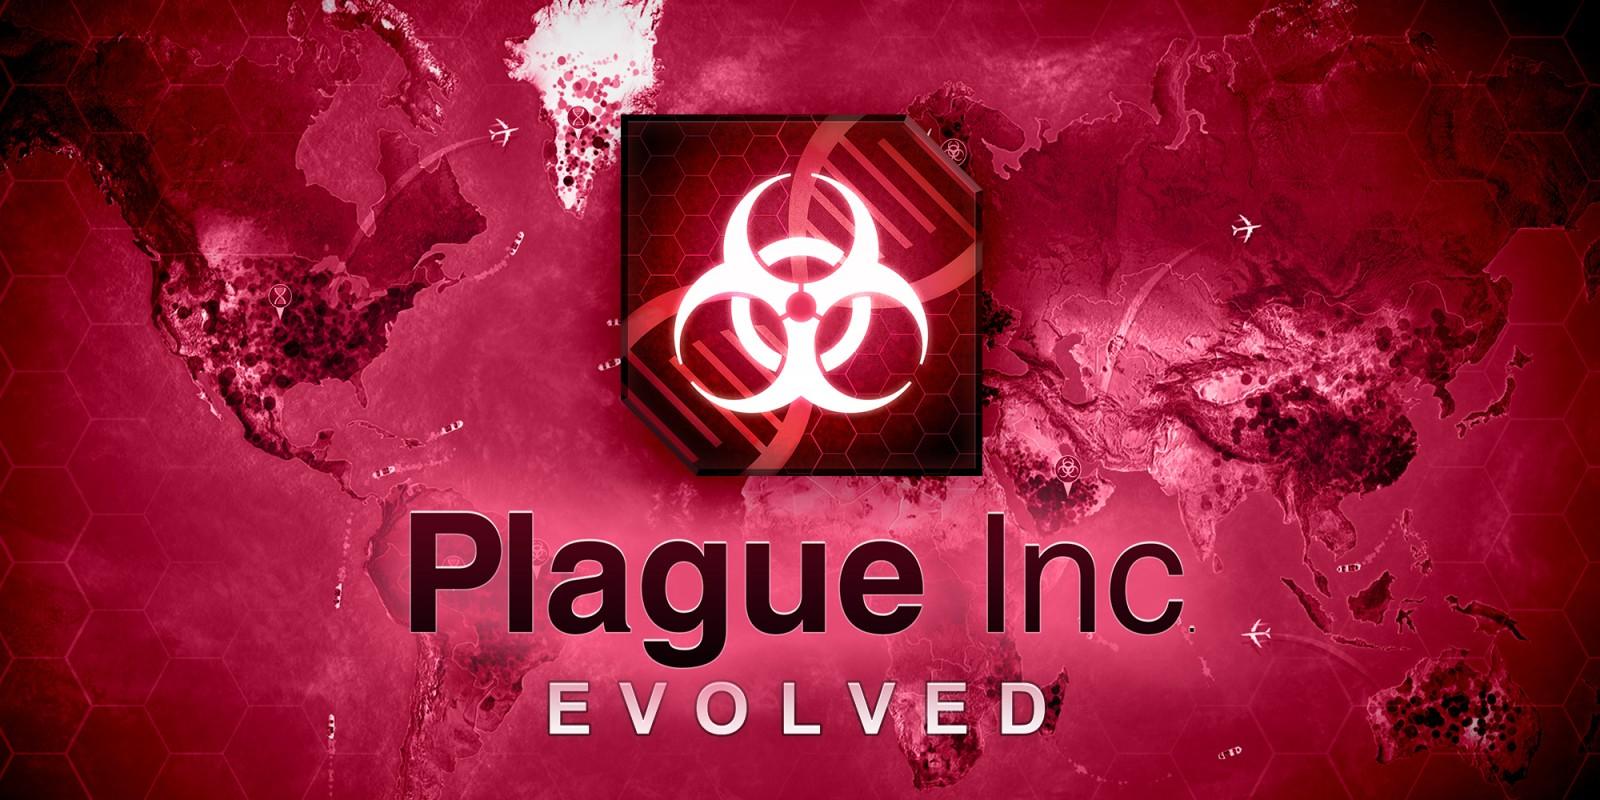 Plague Inc: Evolved Nintendo Switch Review